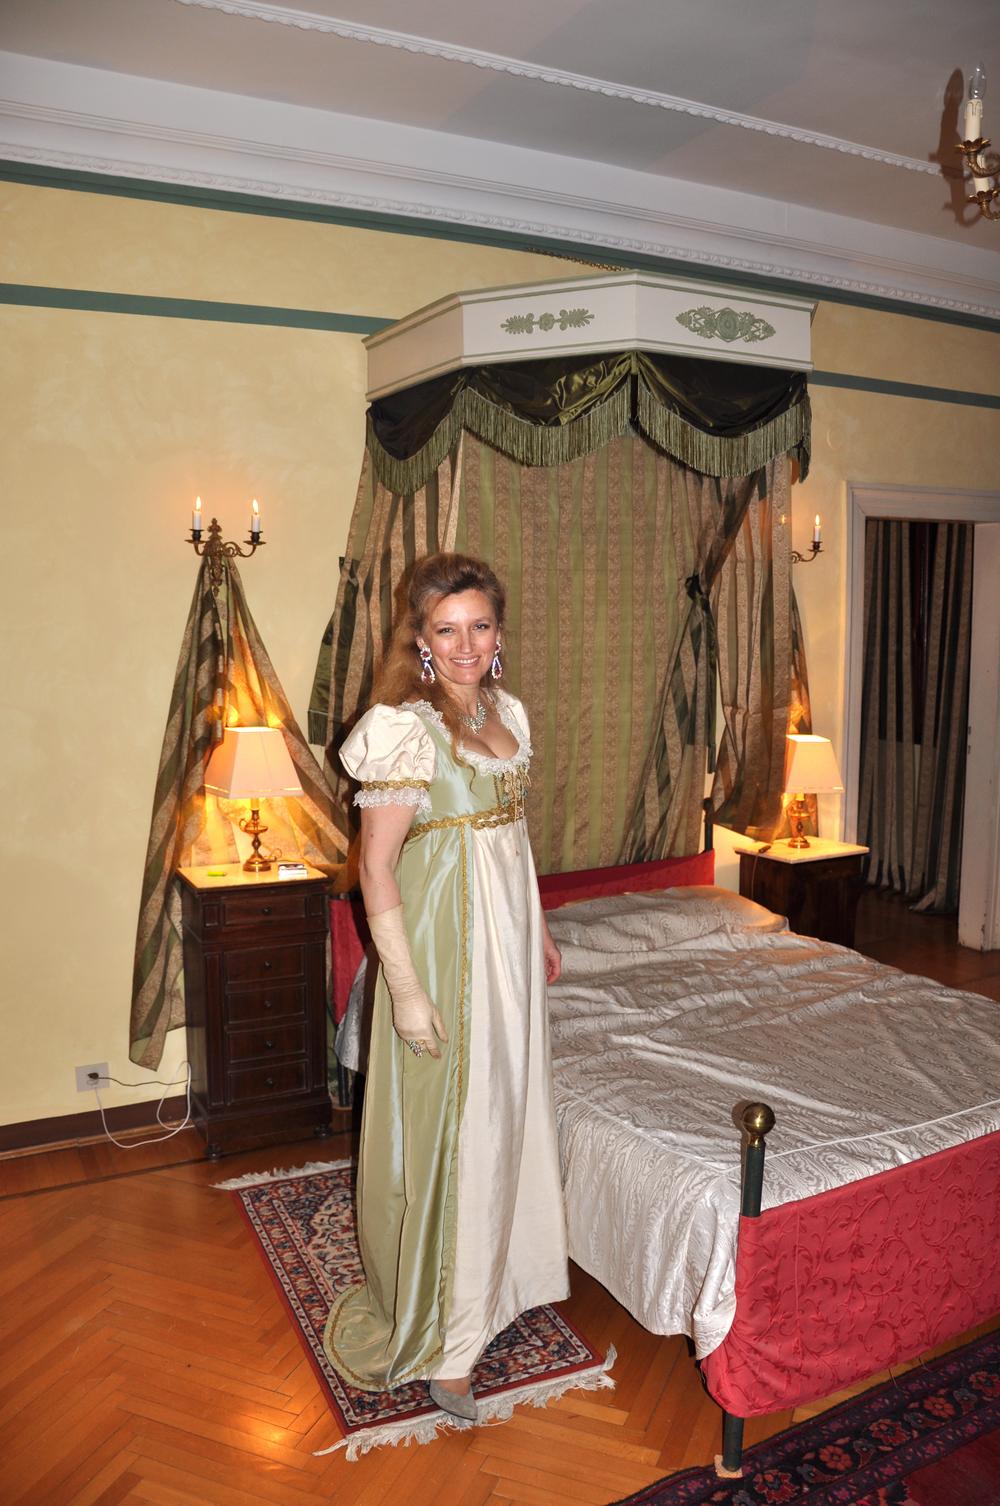 Robe Napoléon 1er en soie ivoire et verte